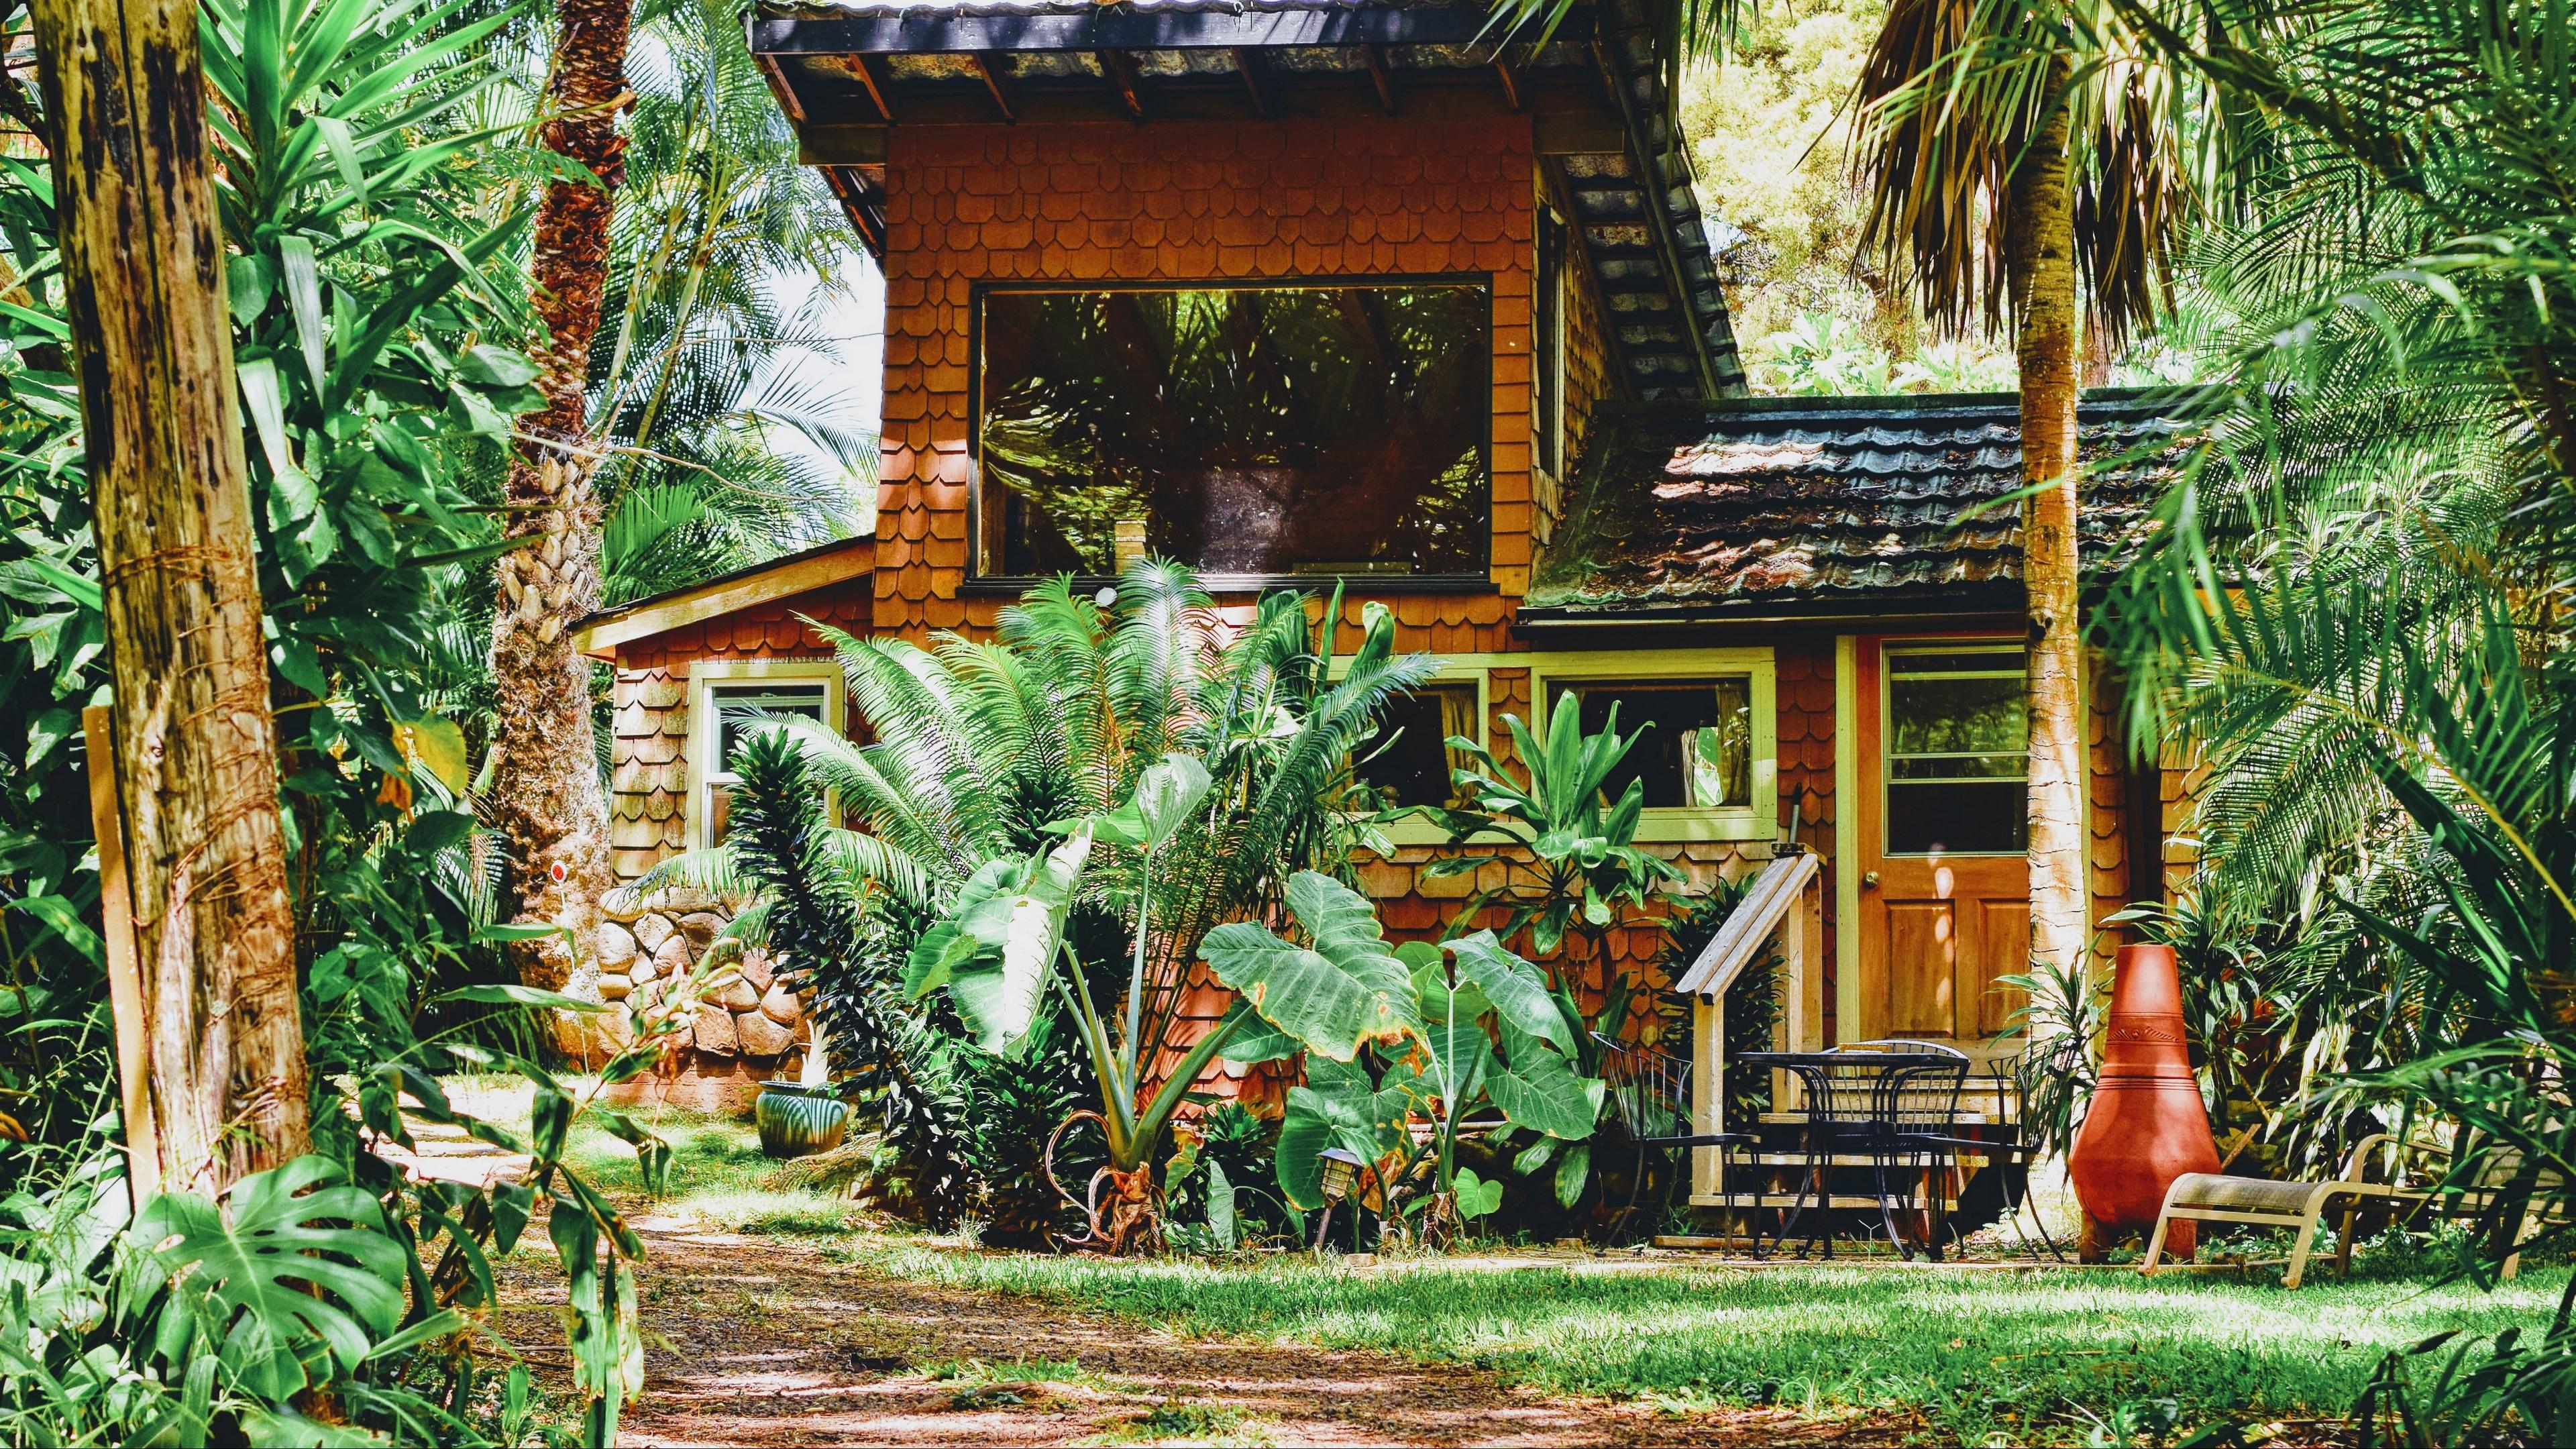 house palm tree plants sunlight 4k 1541114088 - house, palm tree, plants, sunlight 4k - plants, palm tree, House